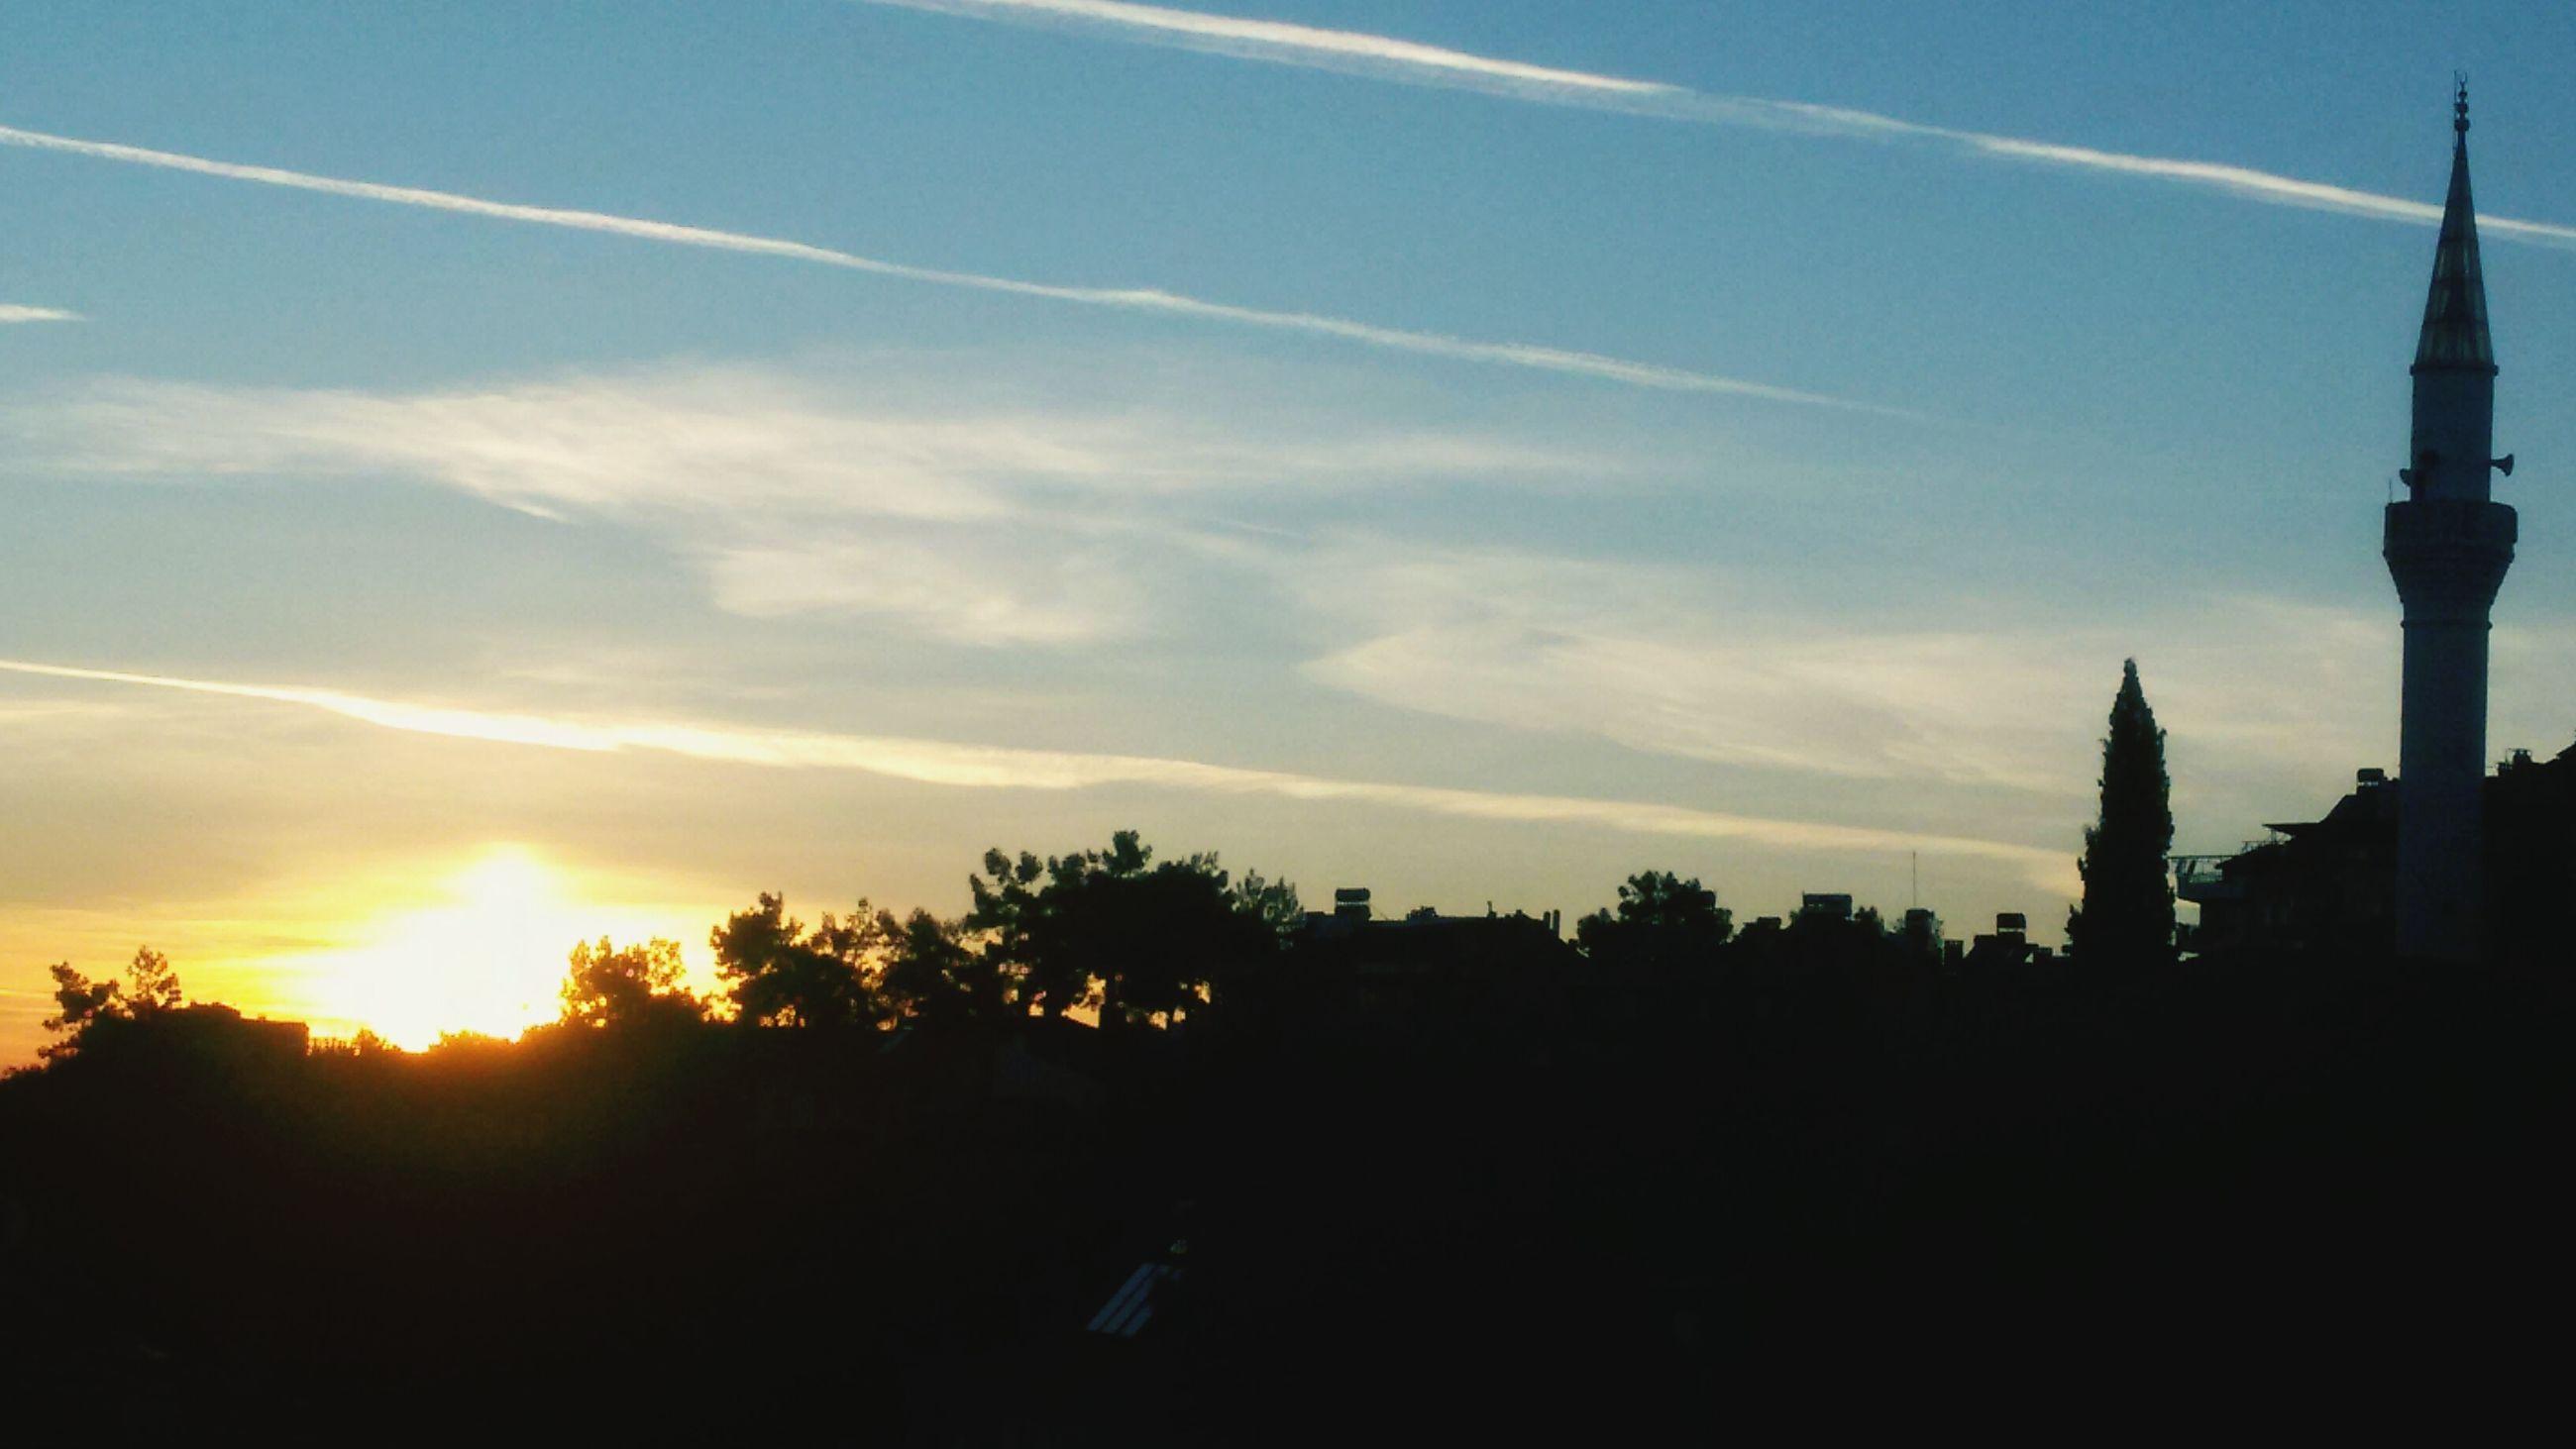 sunset, silhouette, tree, sky, scenics, tranquility, beauty in nature, built structure, architecture, tranquil scene, cloud - sky, building exterior, nature, sun, sunlight, cloud, idyllic, orange color, landscape, no people